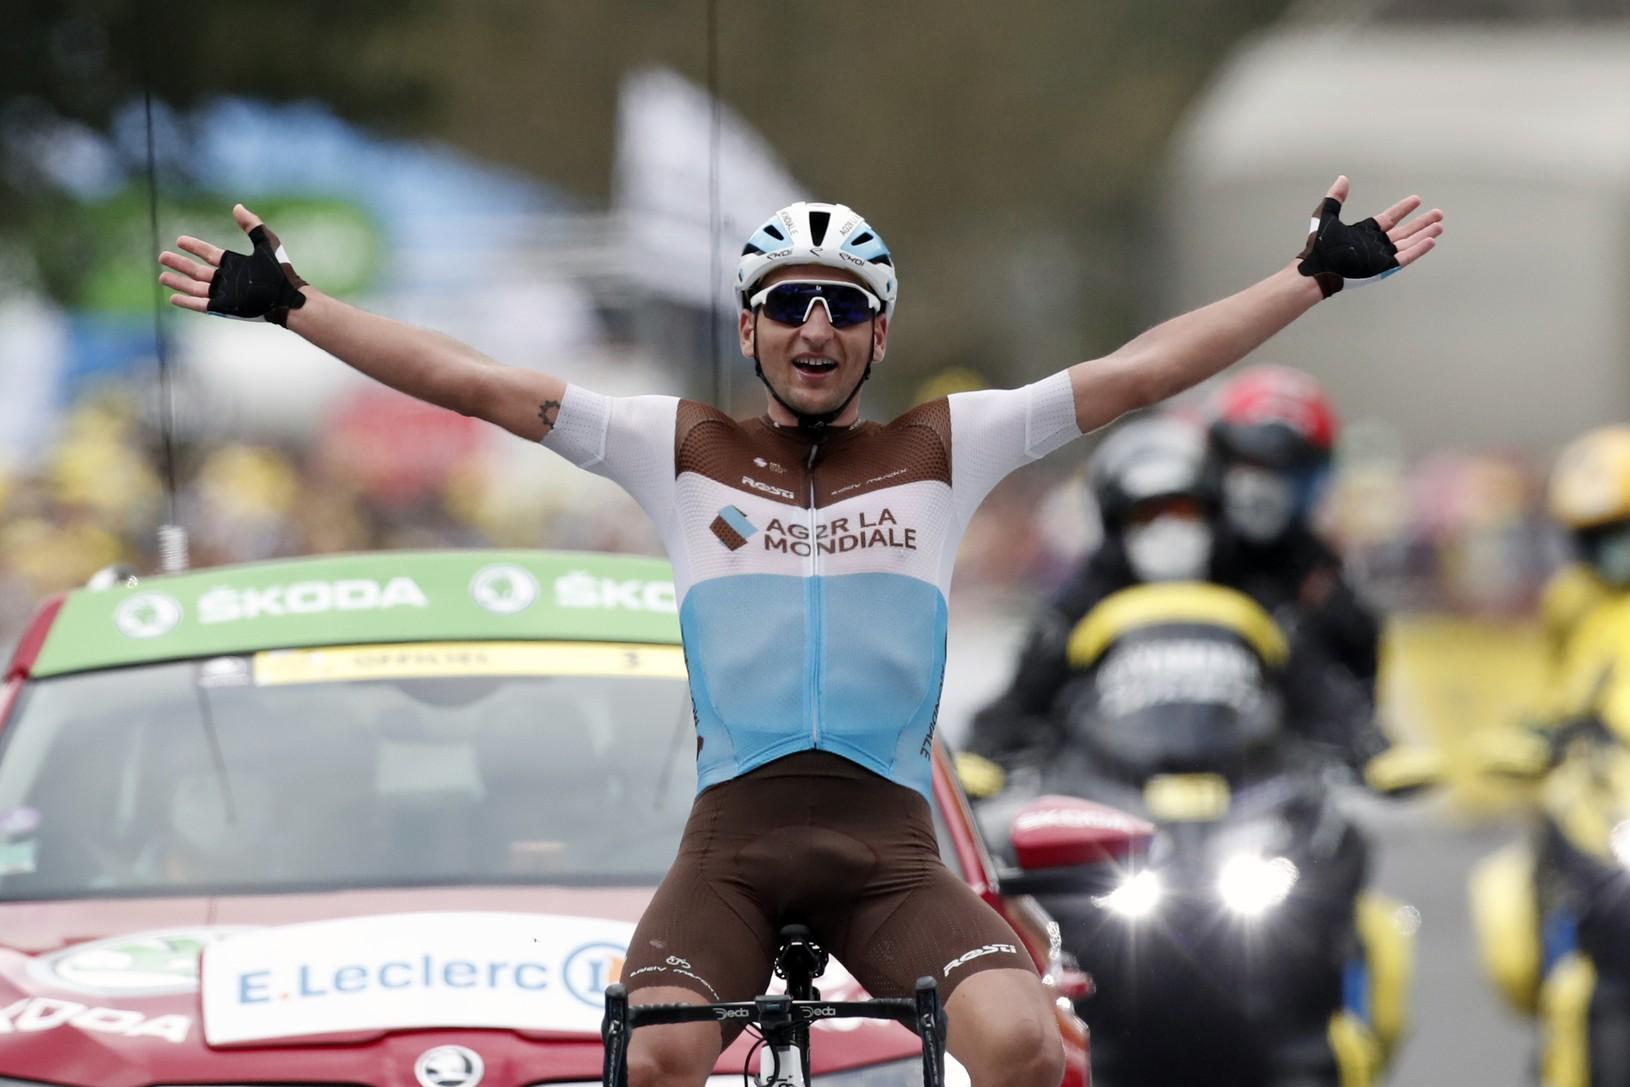 Francúzsky cyklista Nans Peters